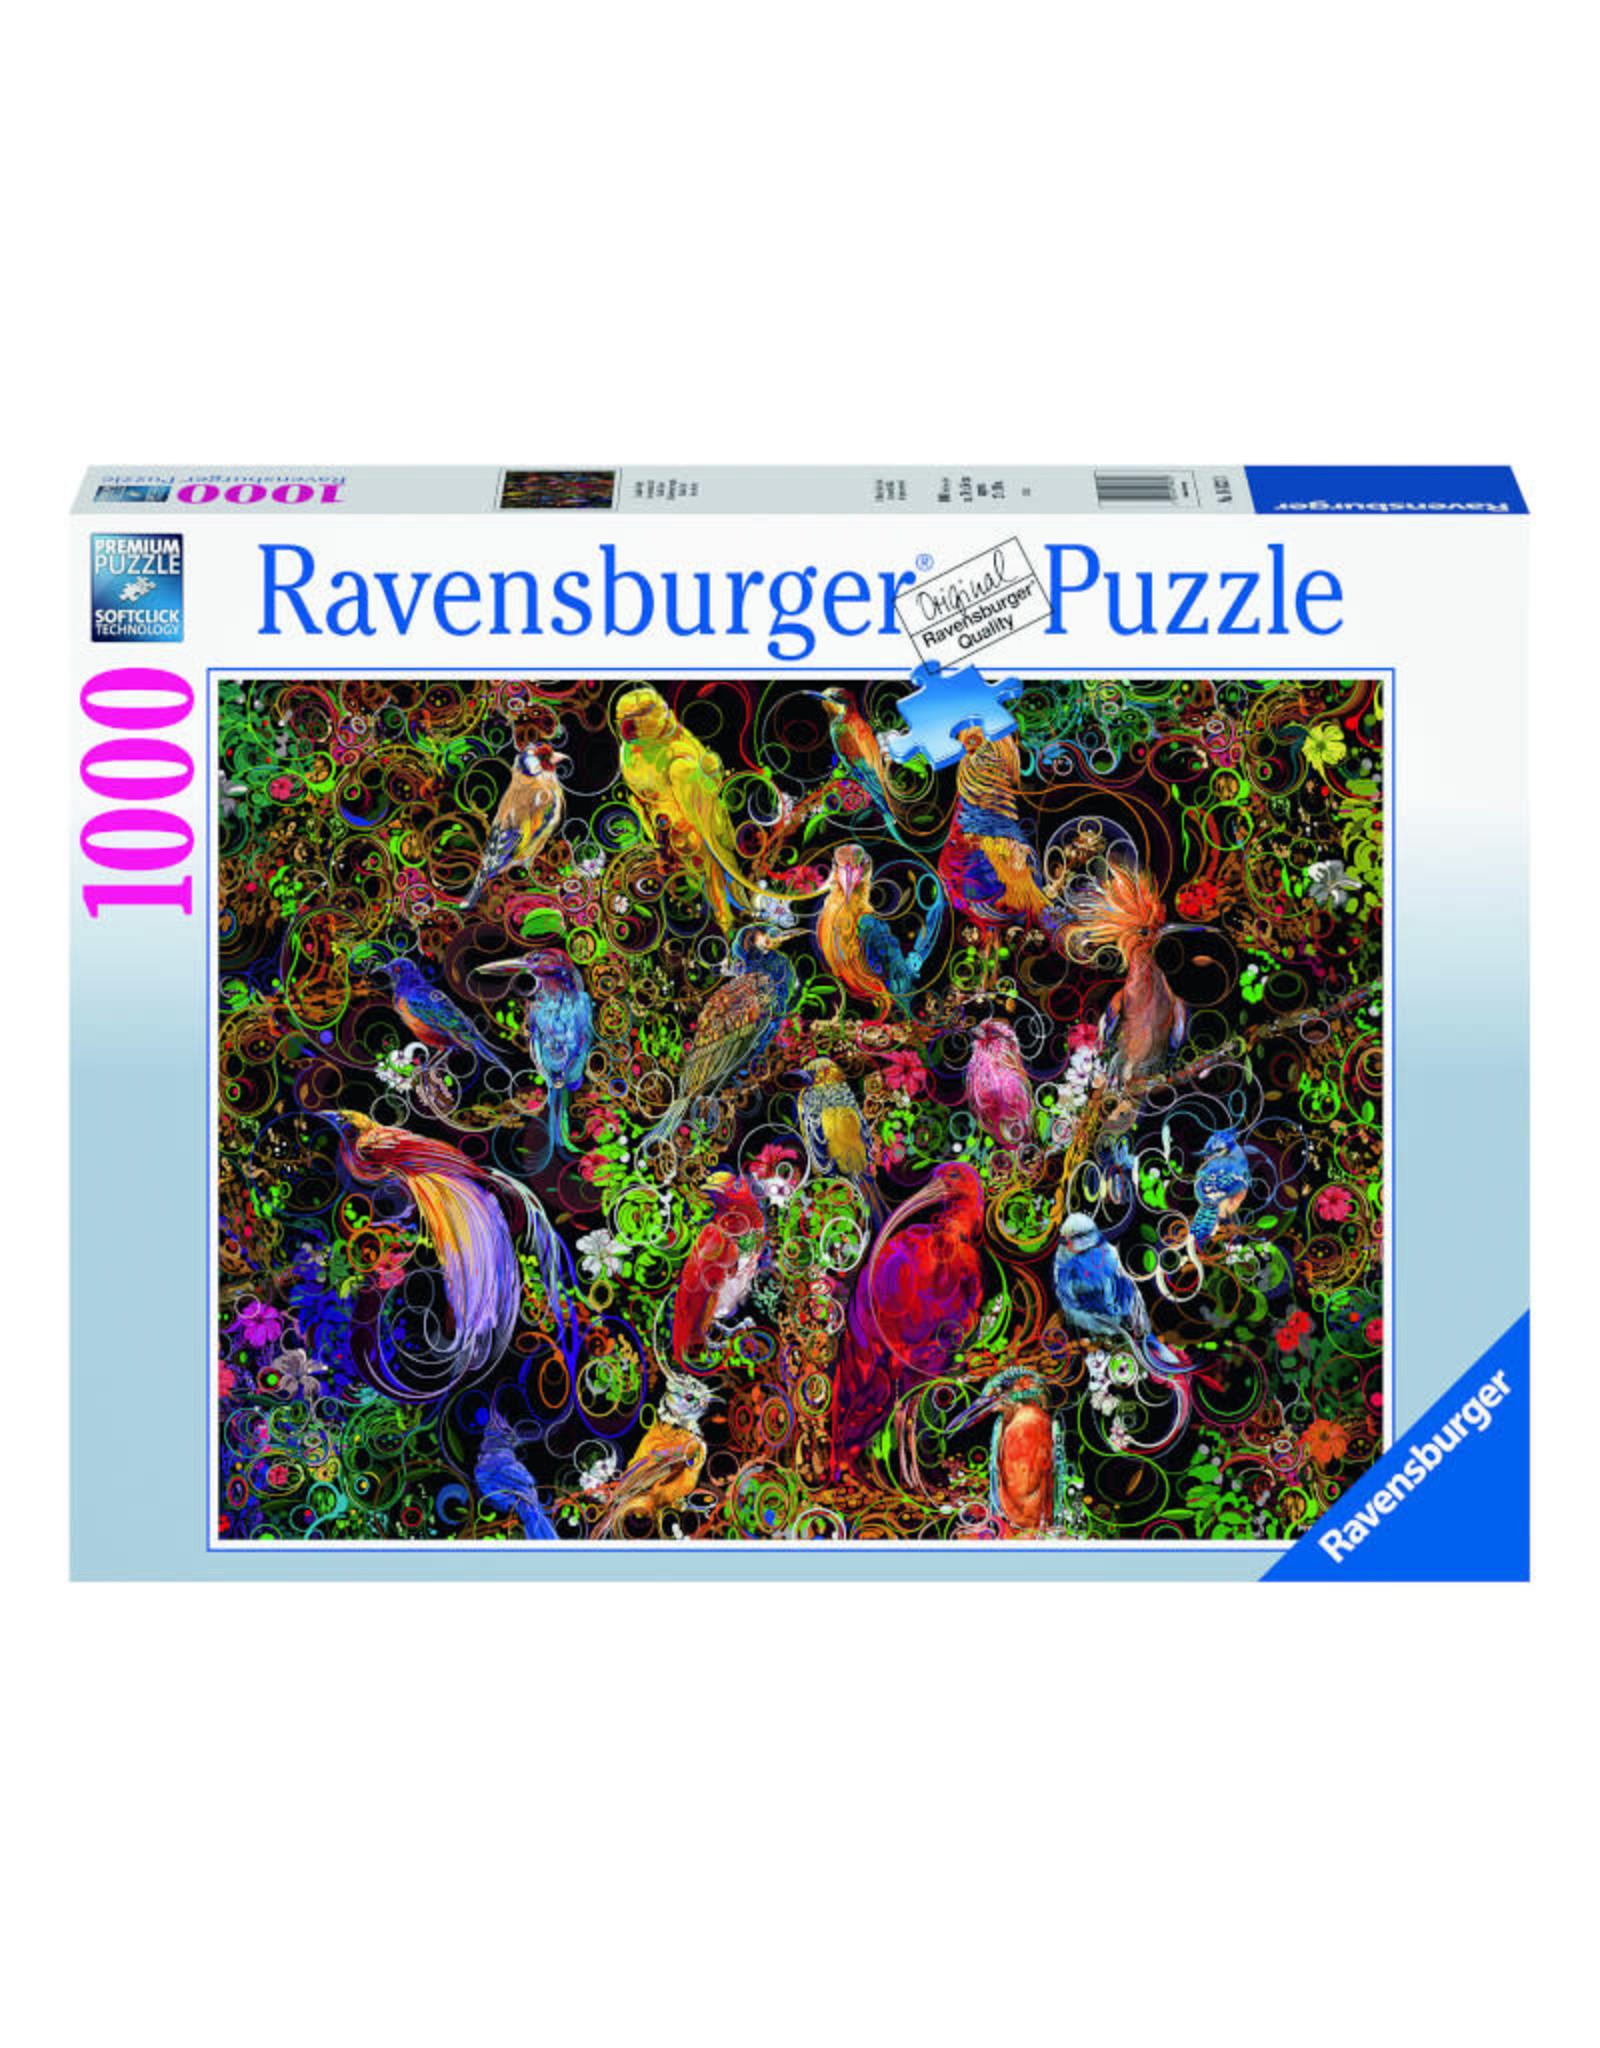 Ravensburger Birds of Art Puzzle 1000 PCS